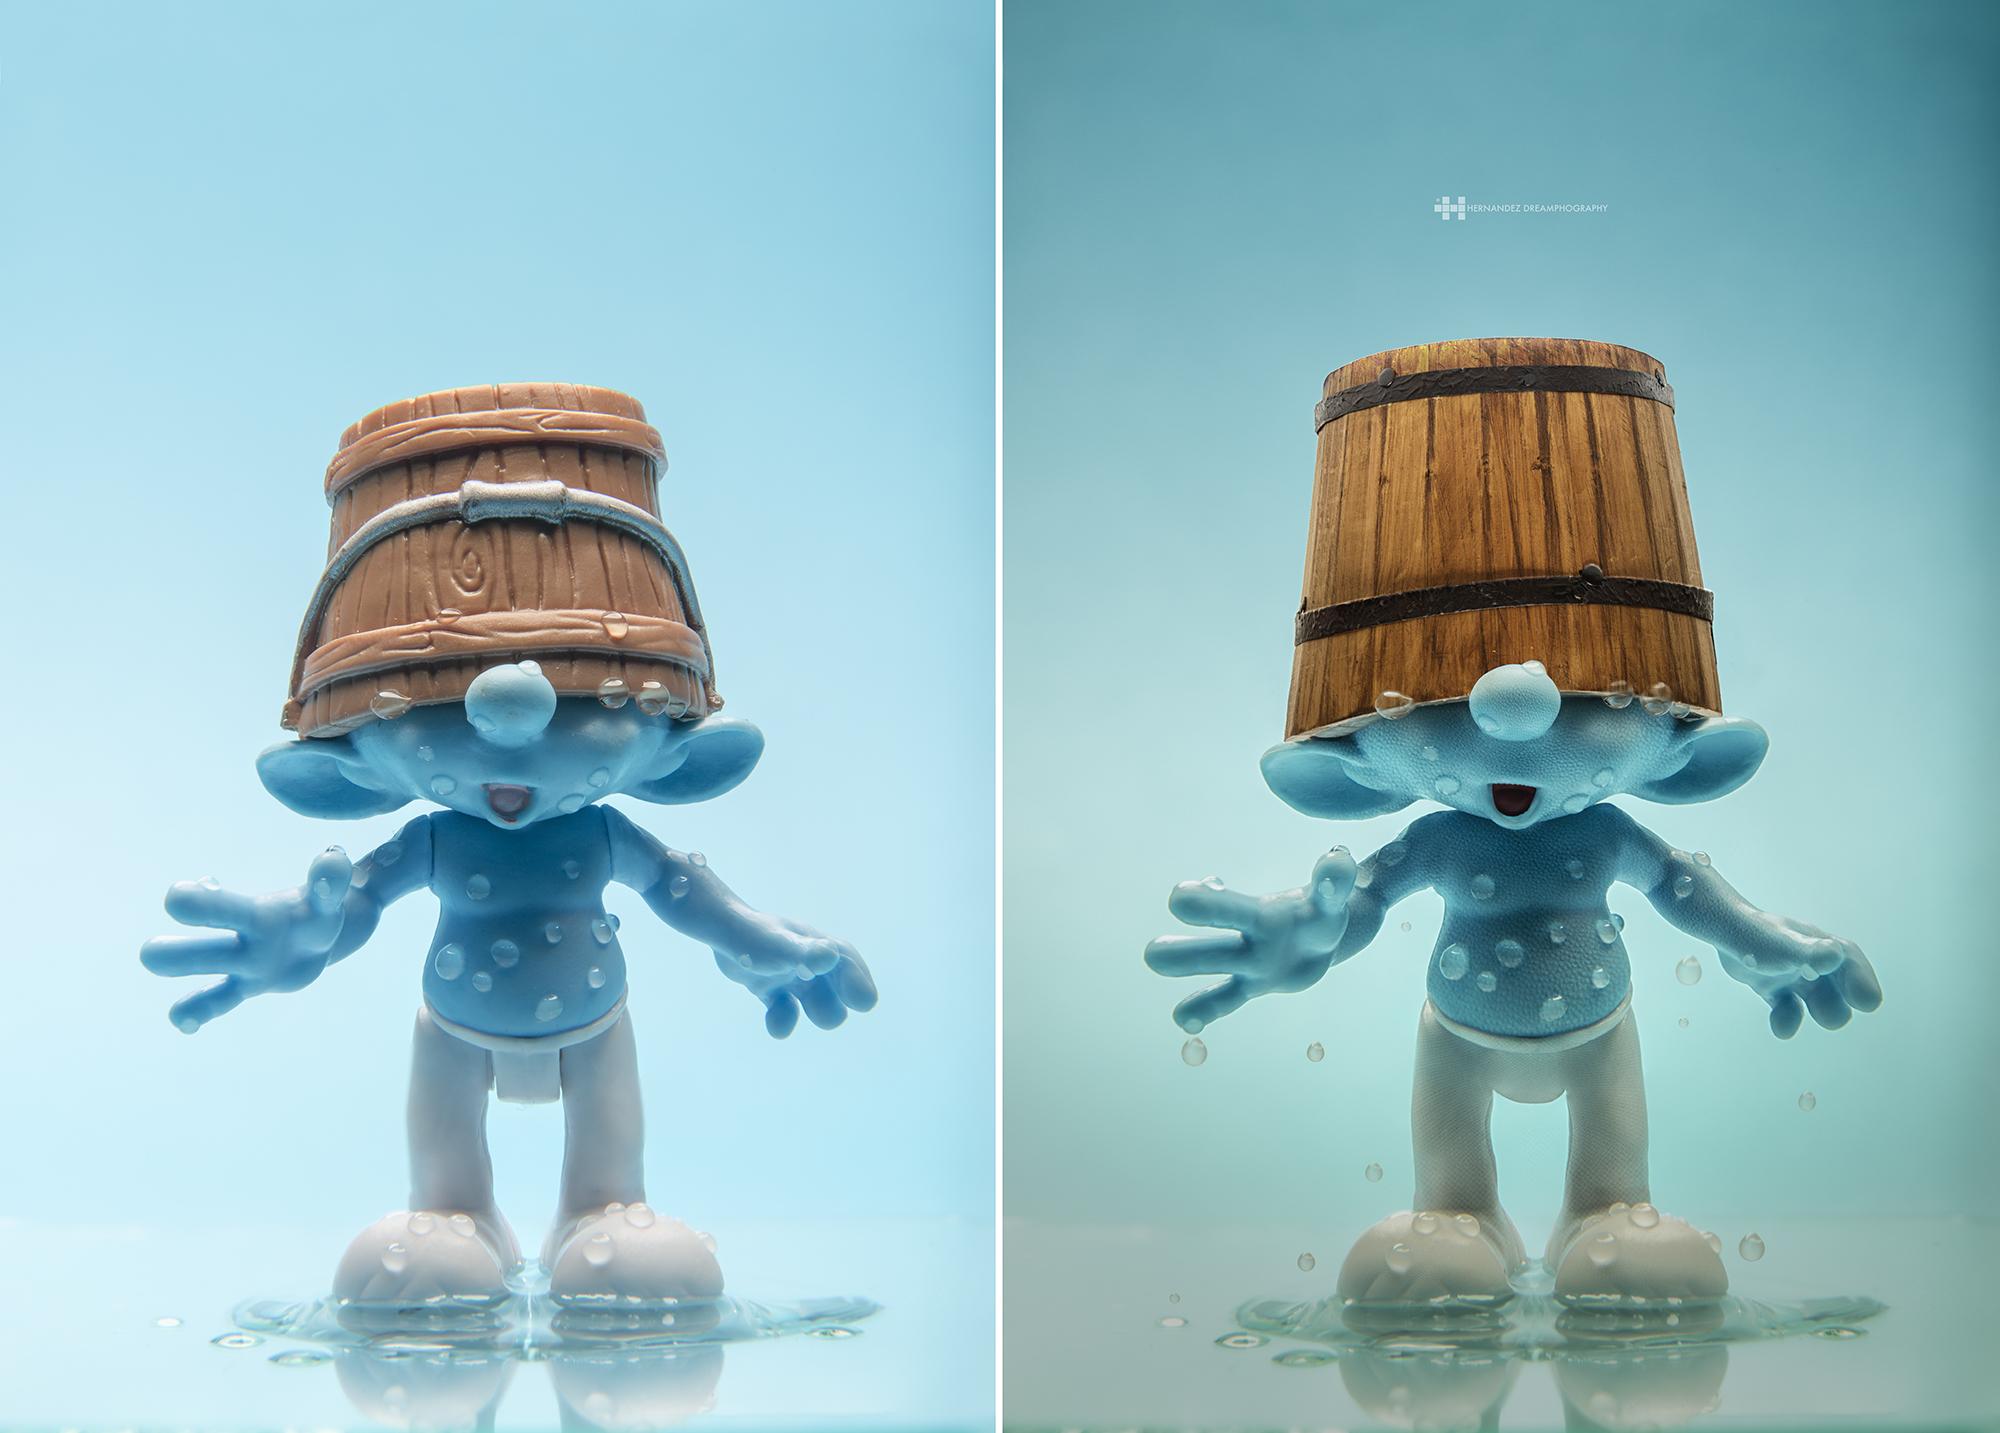 The Smurf RA